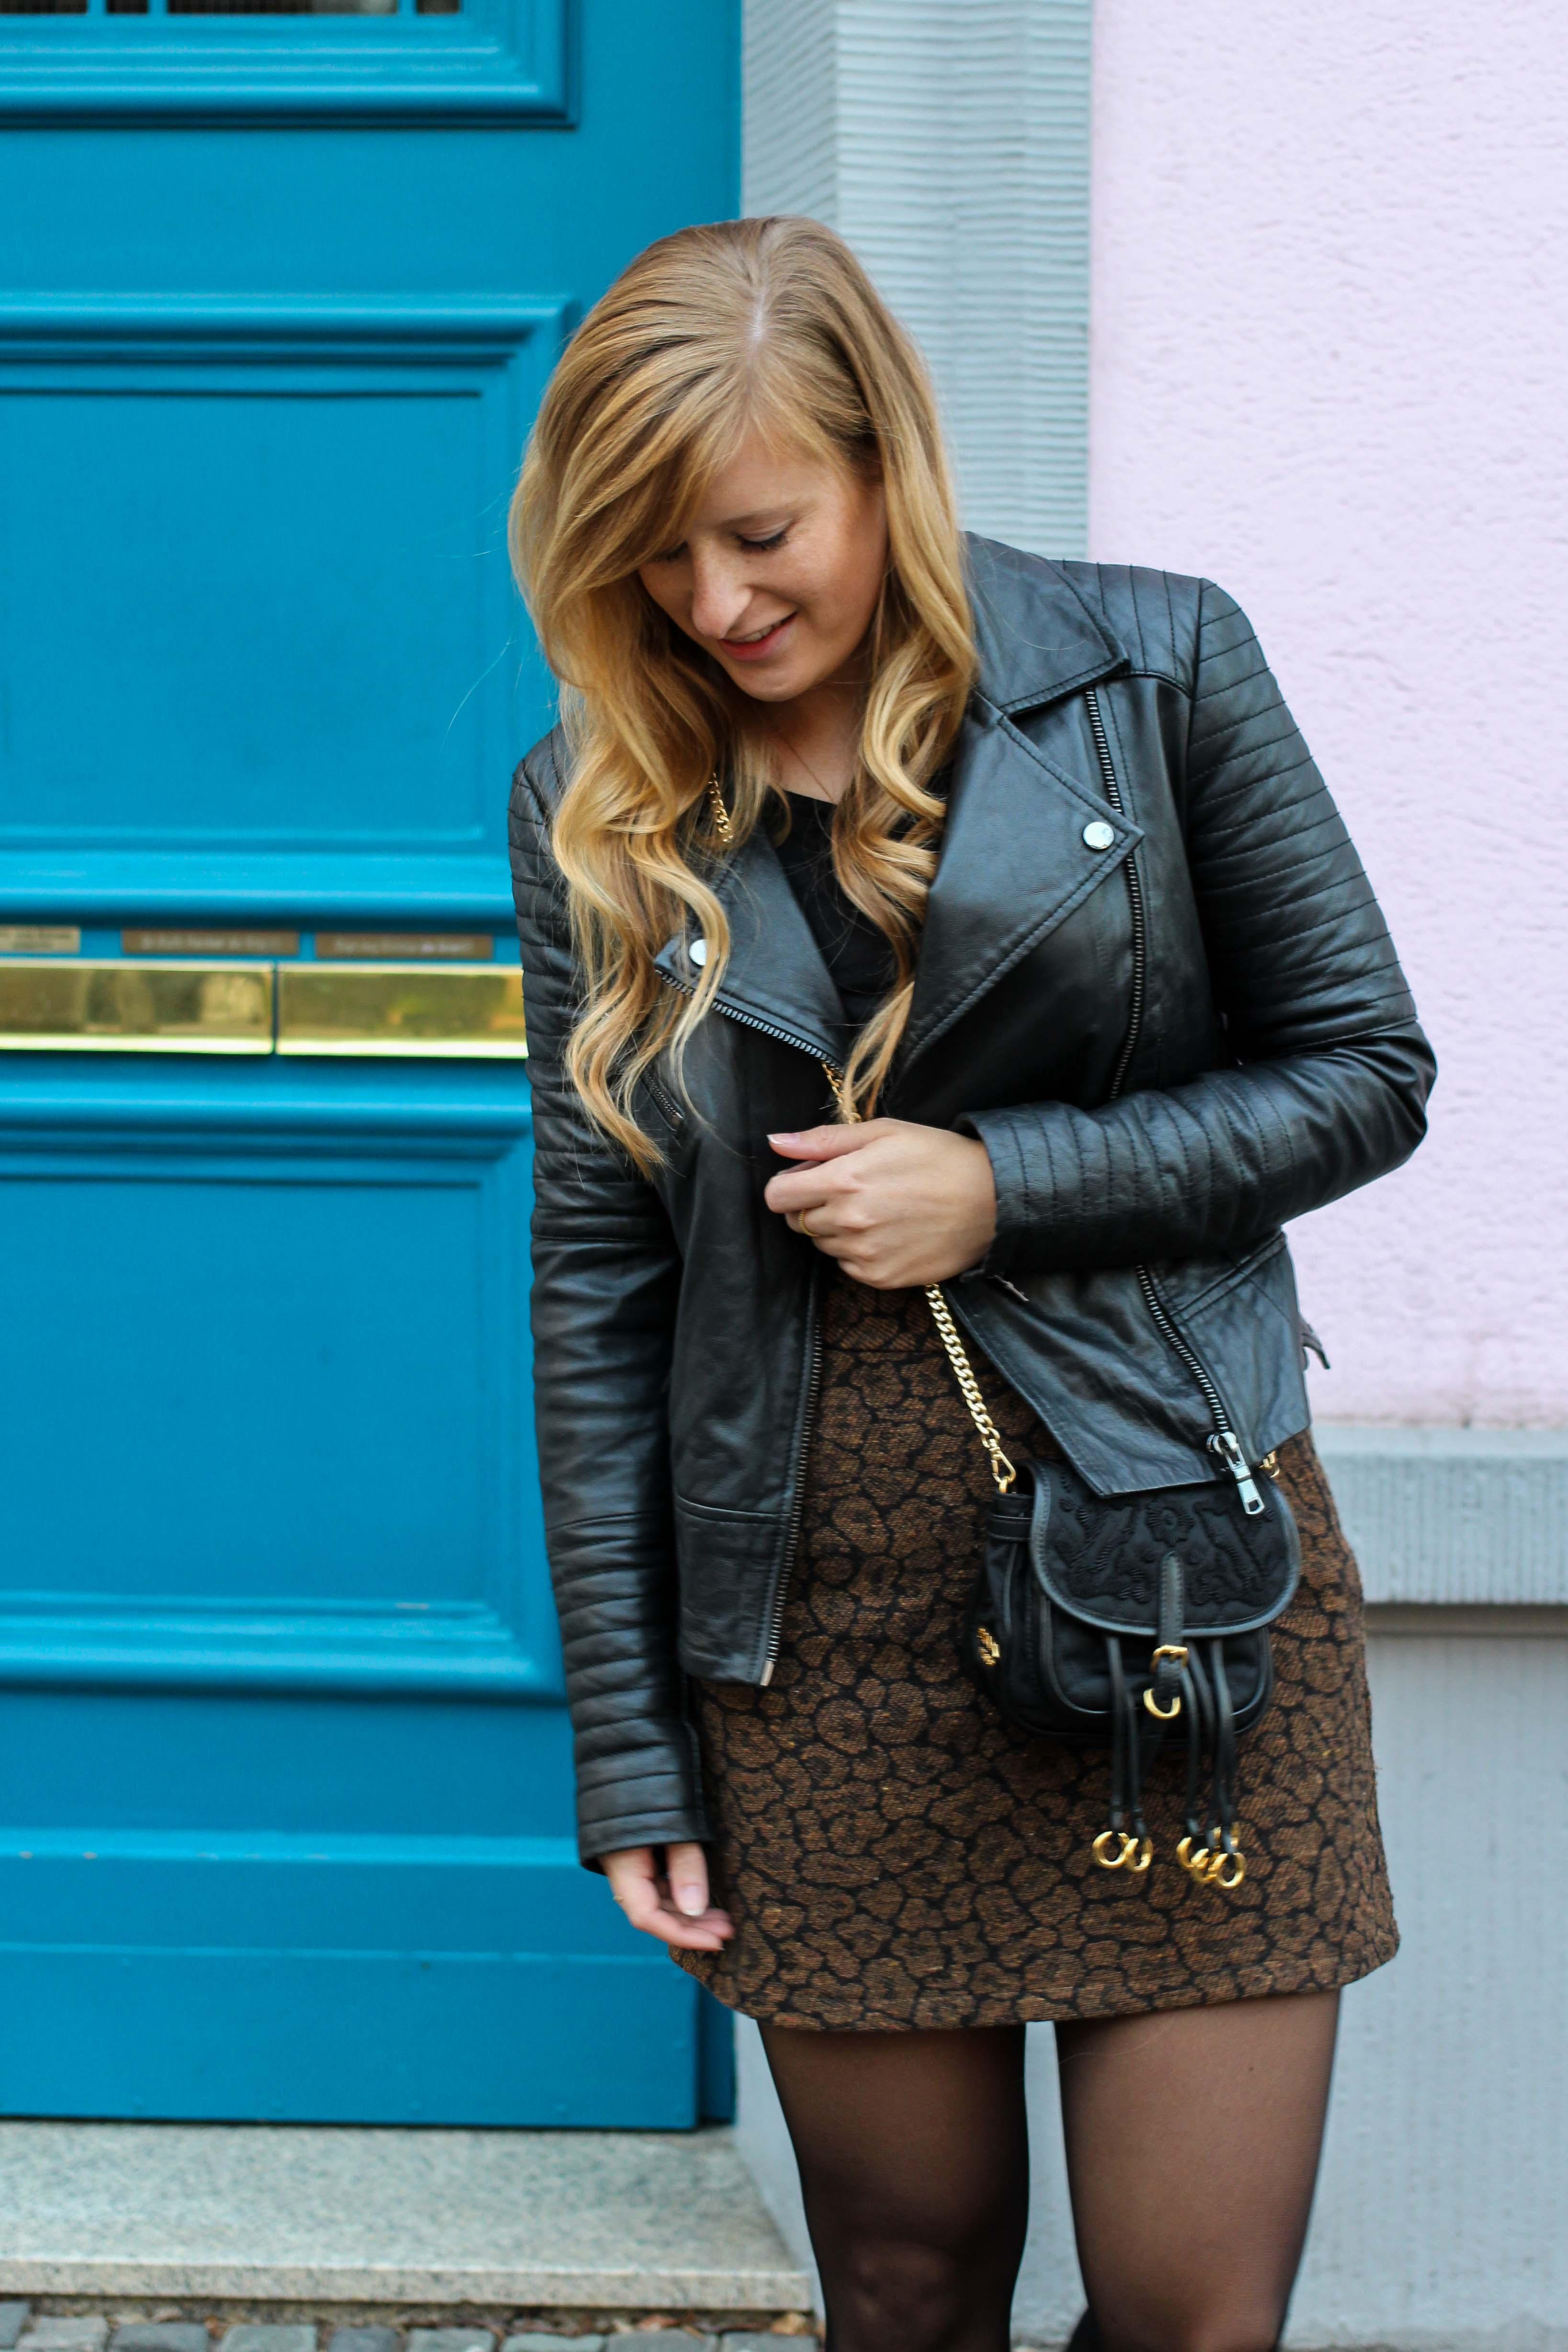 Leo Rock kombinieren Alltag Lederjacke Streetstyle Modeblog Prada Handtasche Stoff Leopard Muster Frühling Strumpfhose 2